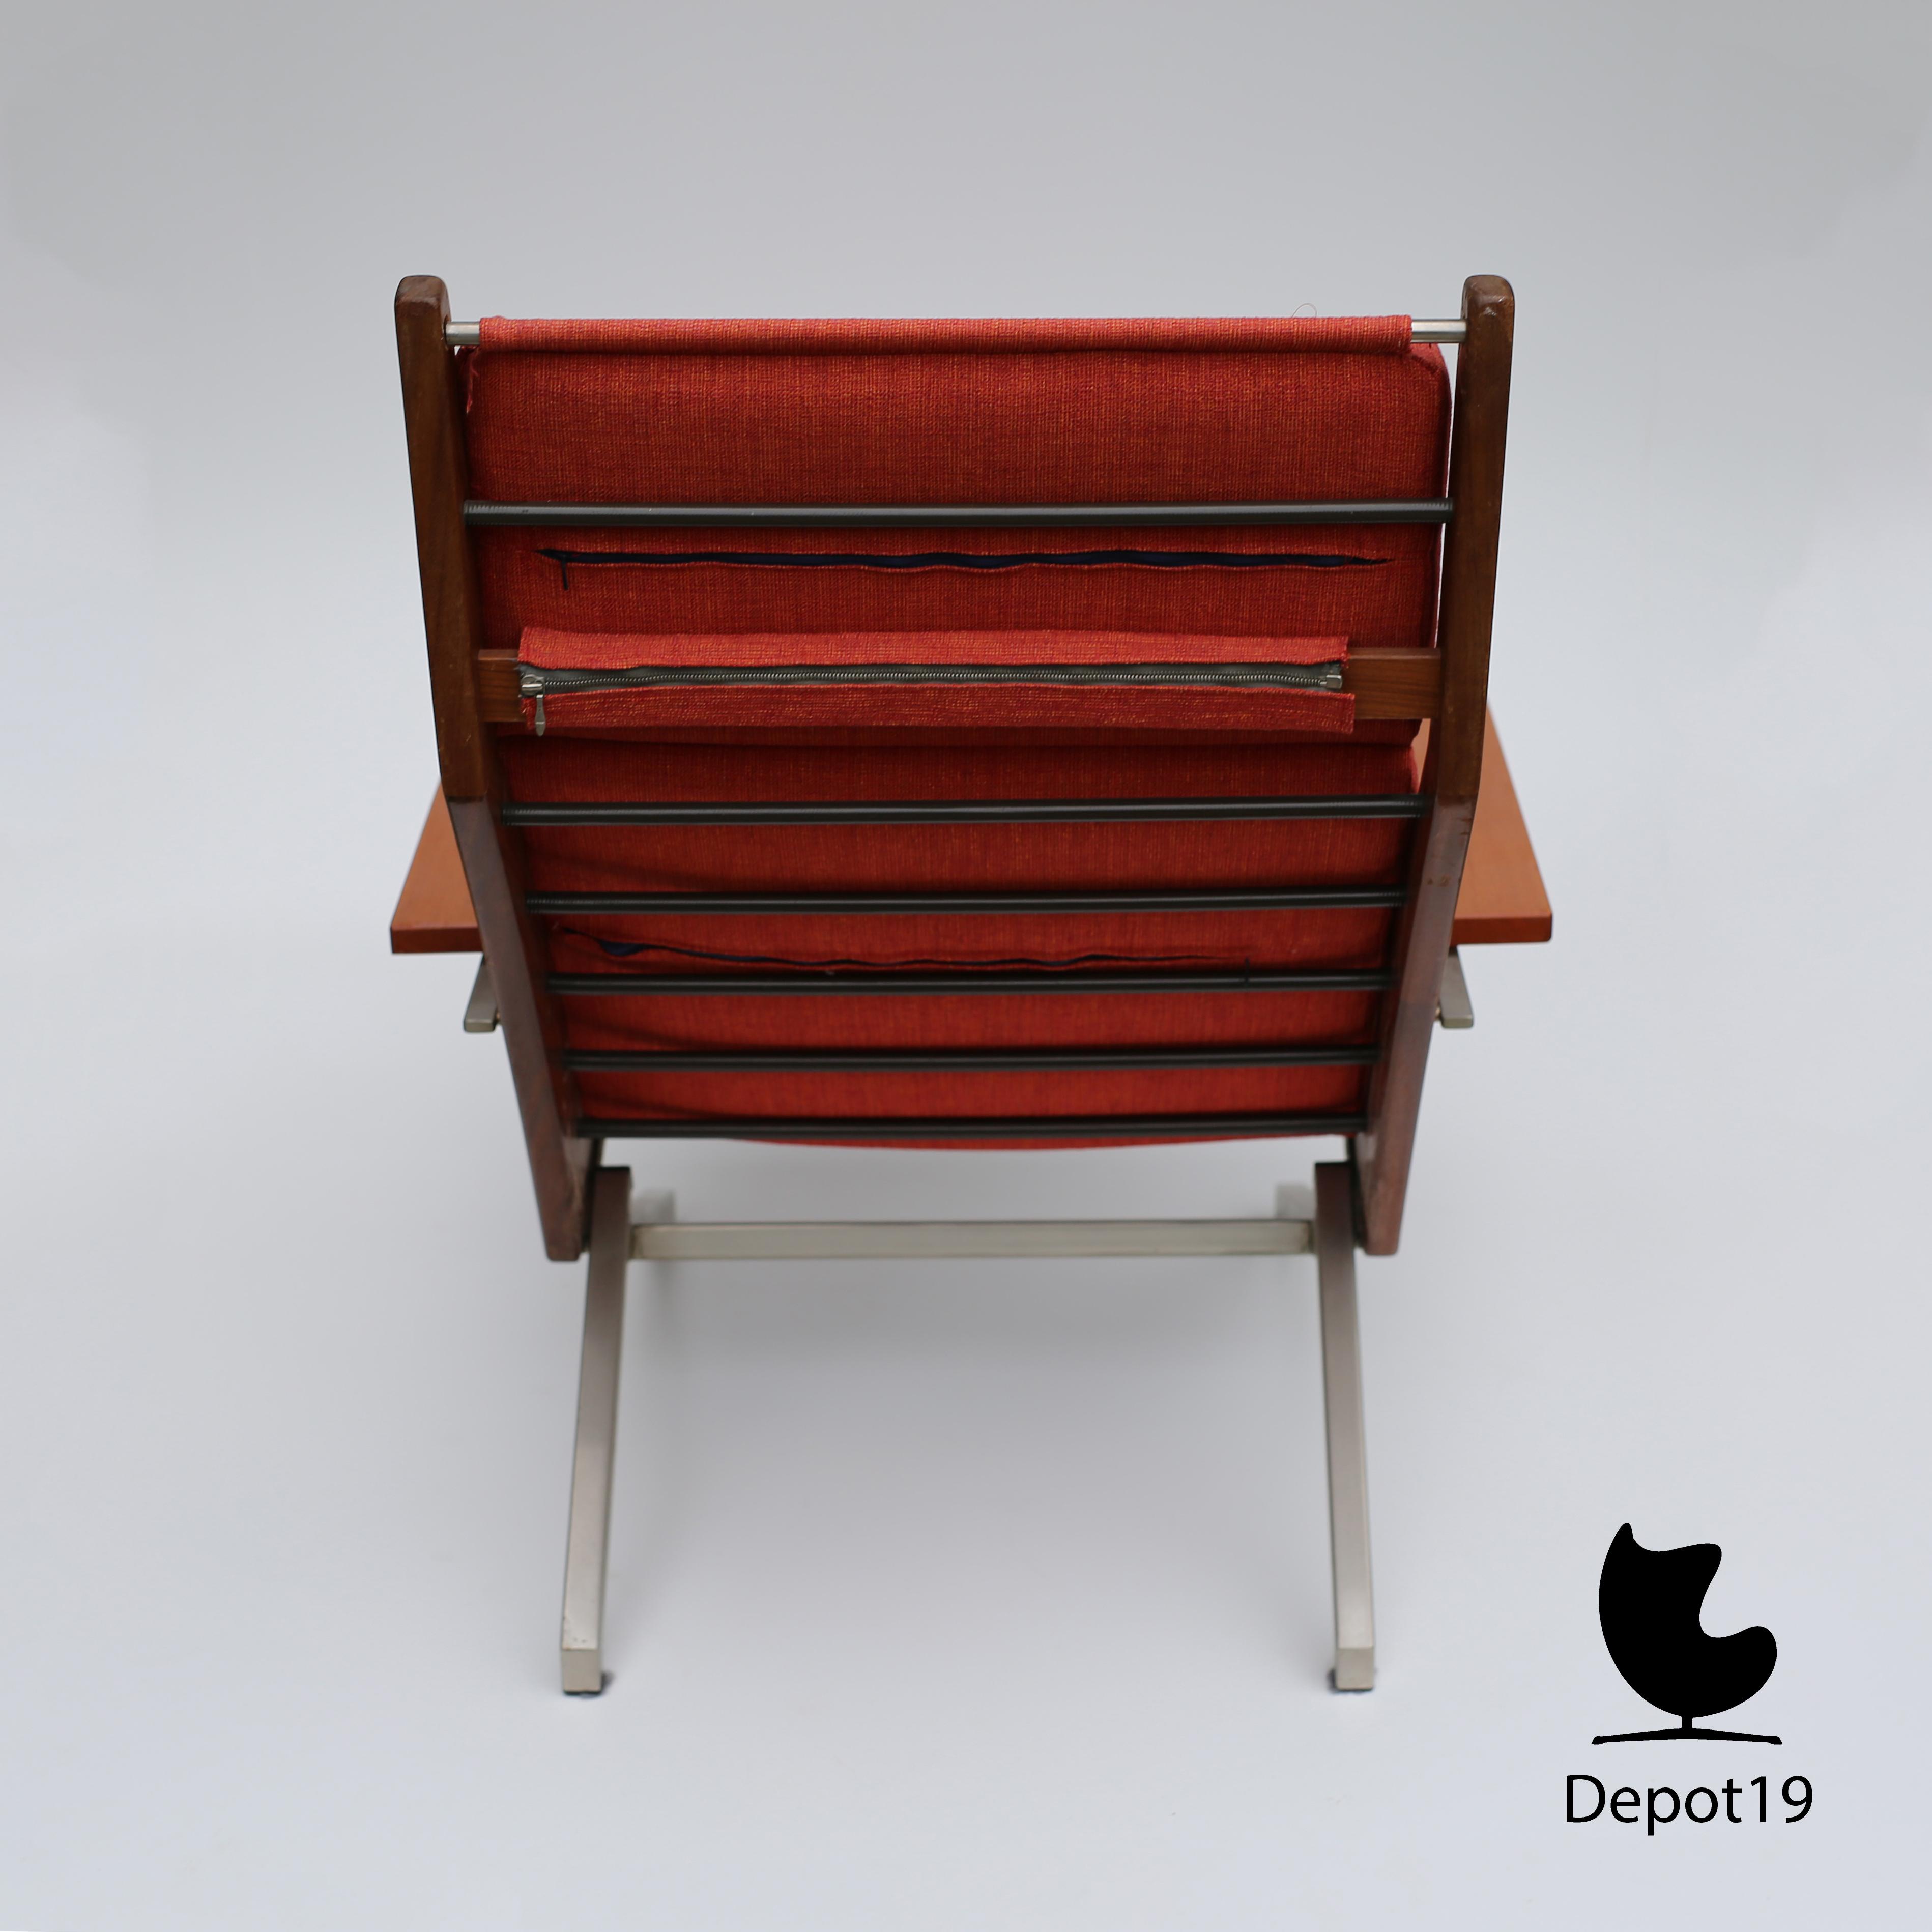 Astonishing Rob Parry Lotus Lounge Chair Gelderland Nl Depot 19 Pdpeps Interior Chair Design Pdpepsorg